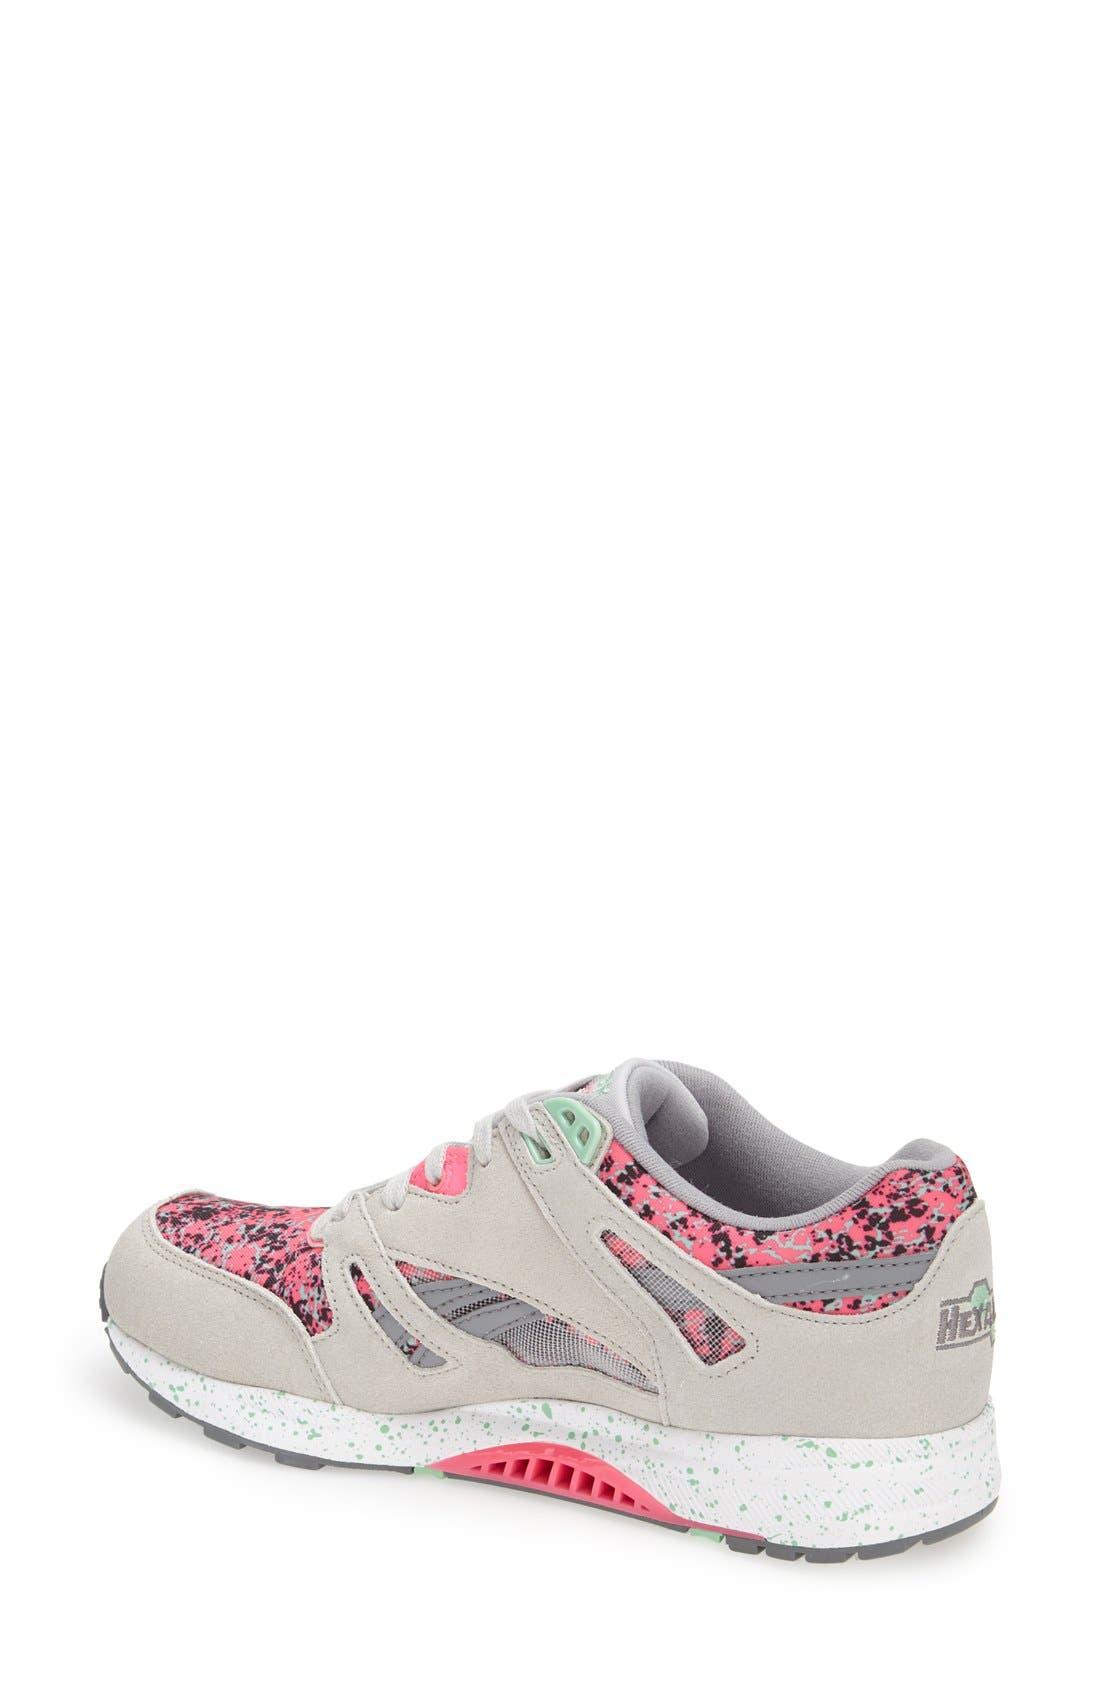 Alternate Image 2  - Reebok 'Ventilator CC' Sneaker (Women)